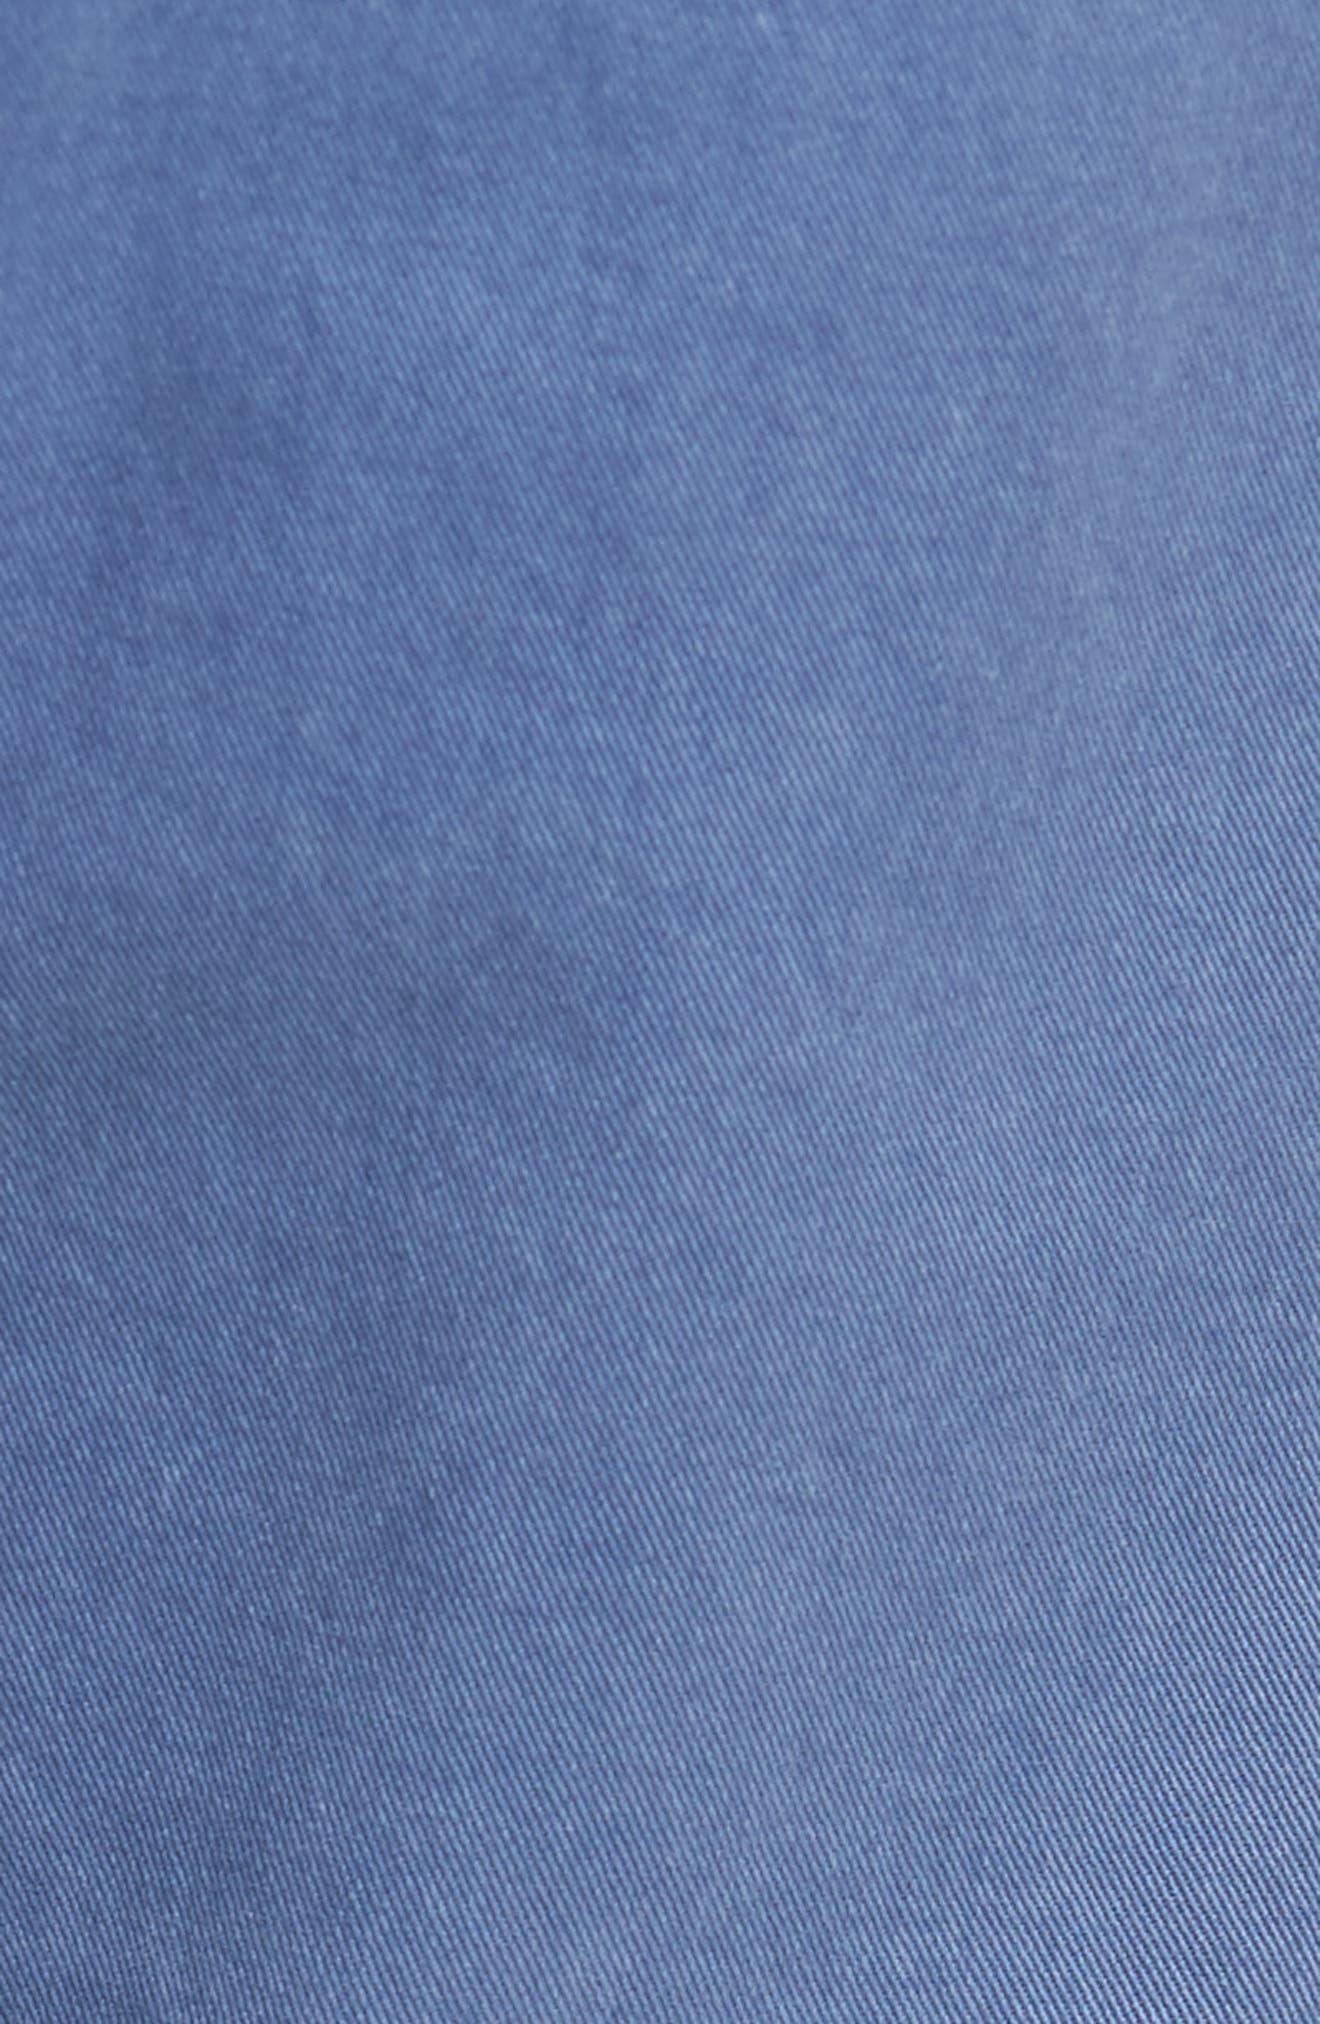 Lennox Slim Fit Five-Pocket Pants,                             Alternate thumbnail 5, color,                             Vintage Mariner